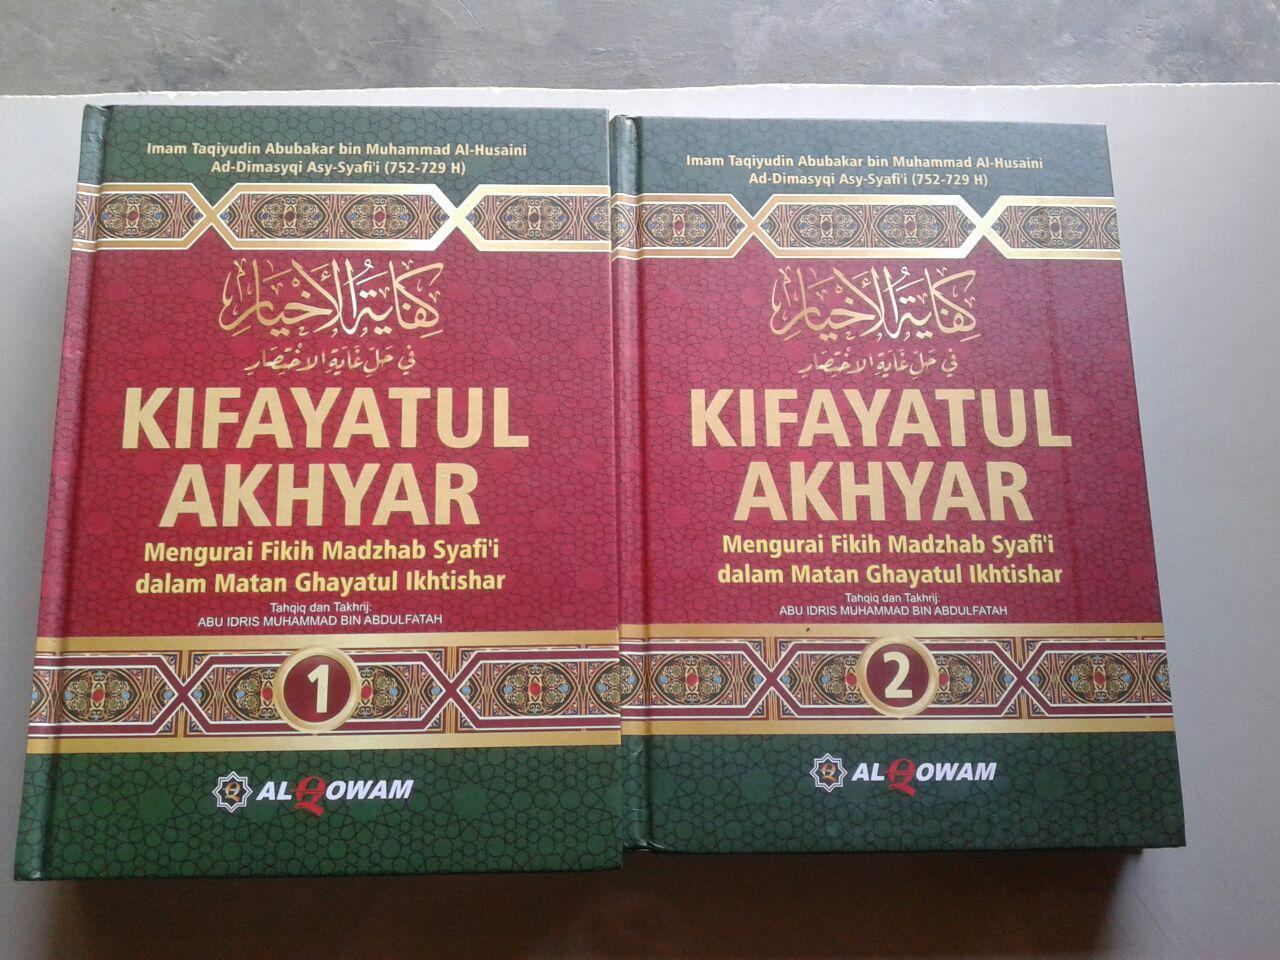 Buku Kifayatul Akhyar Mengurai Fikih Madzhab Syafi'i Set 2 Jilid cover 2